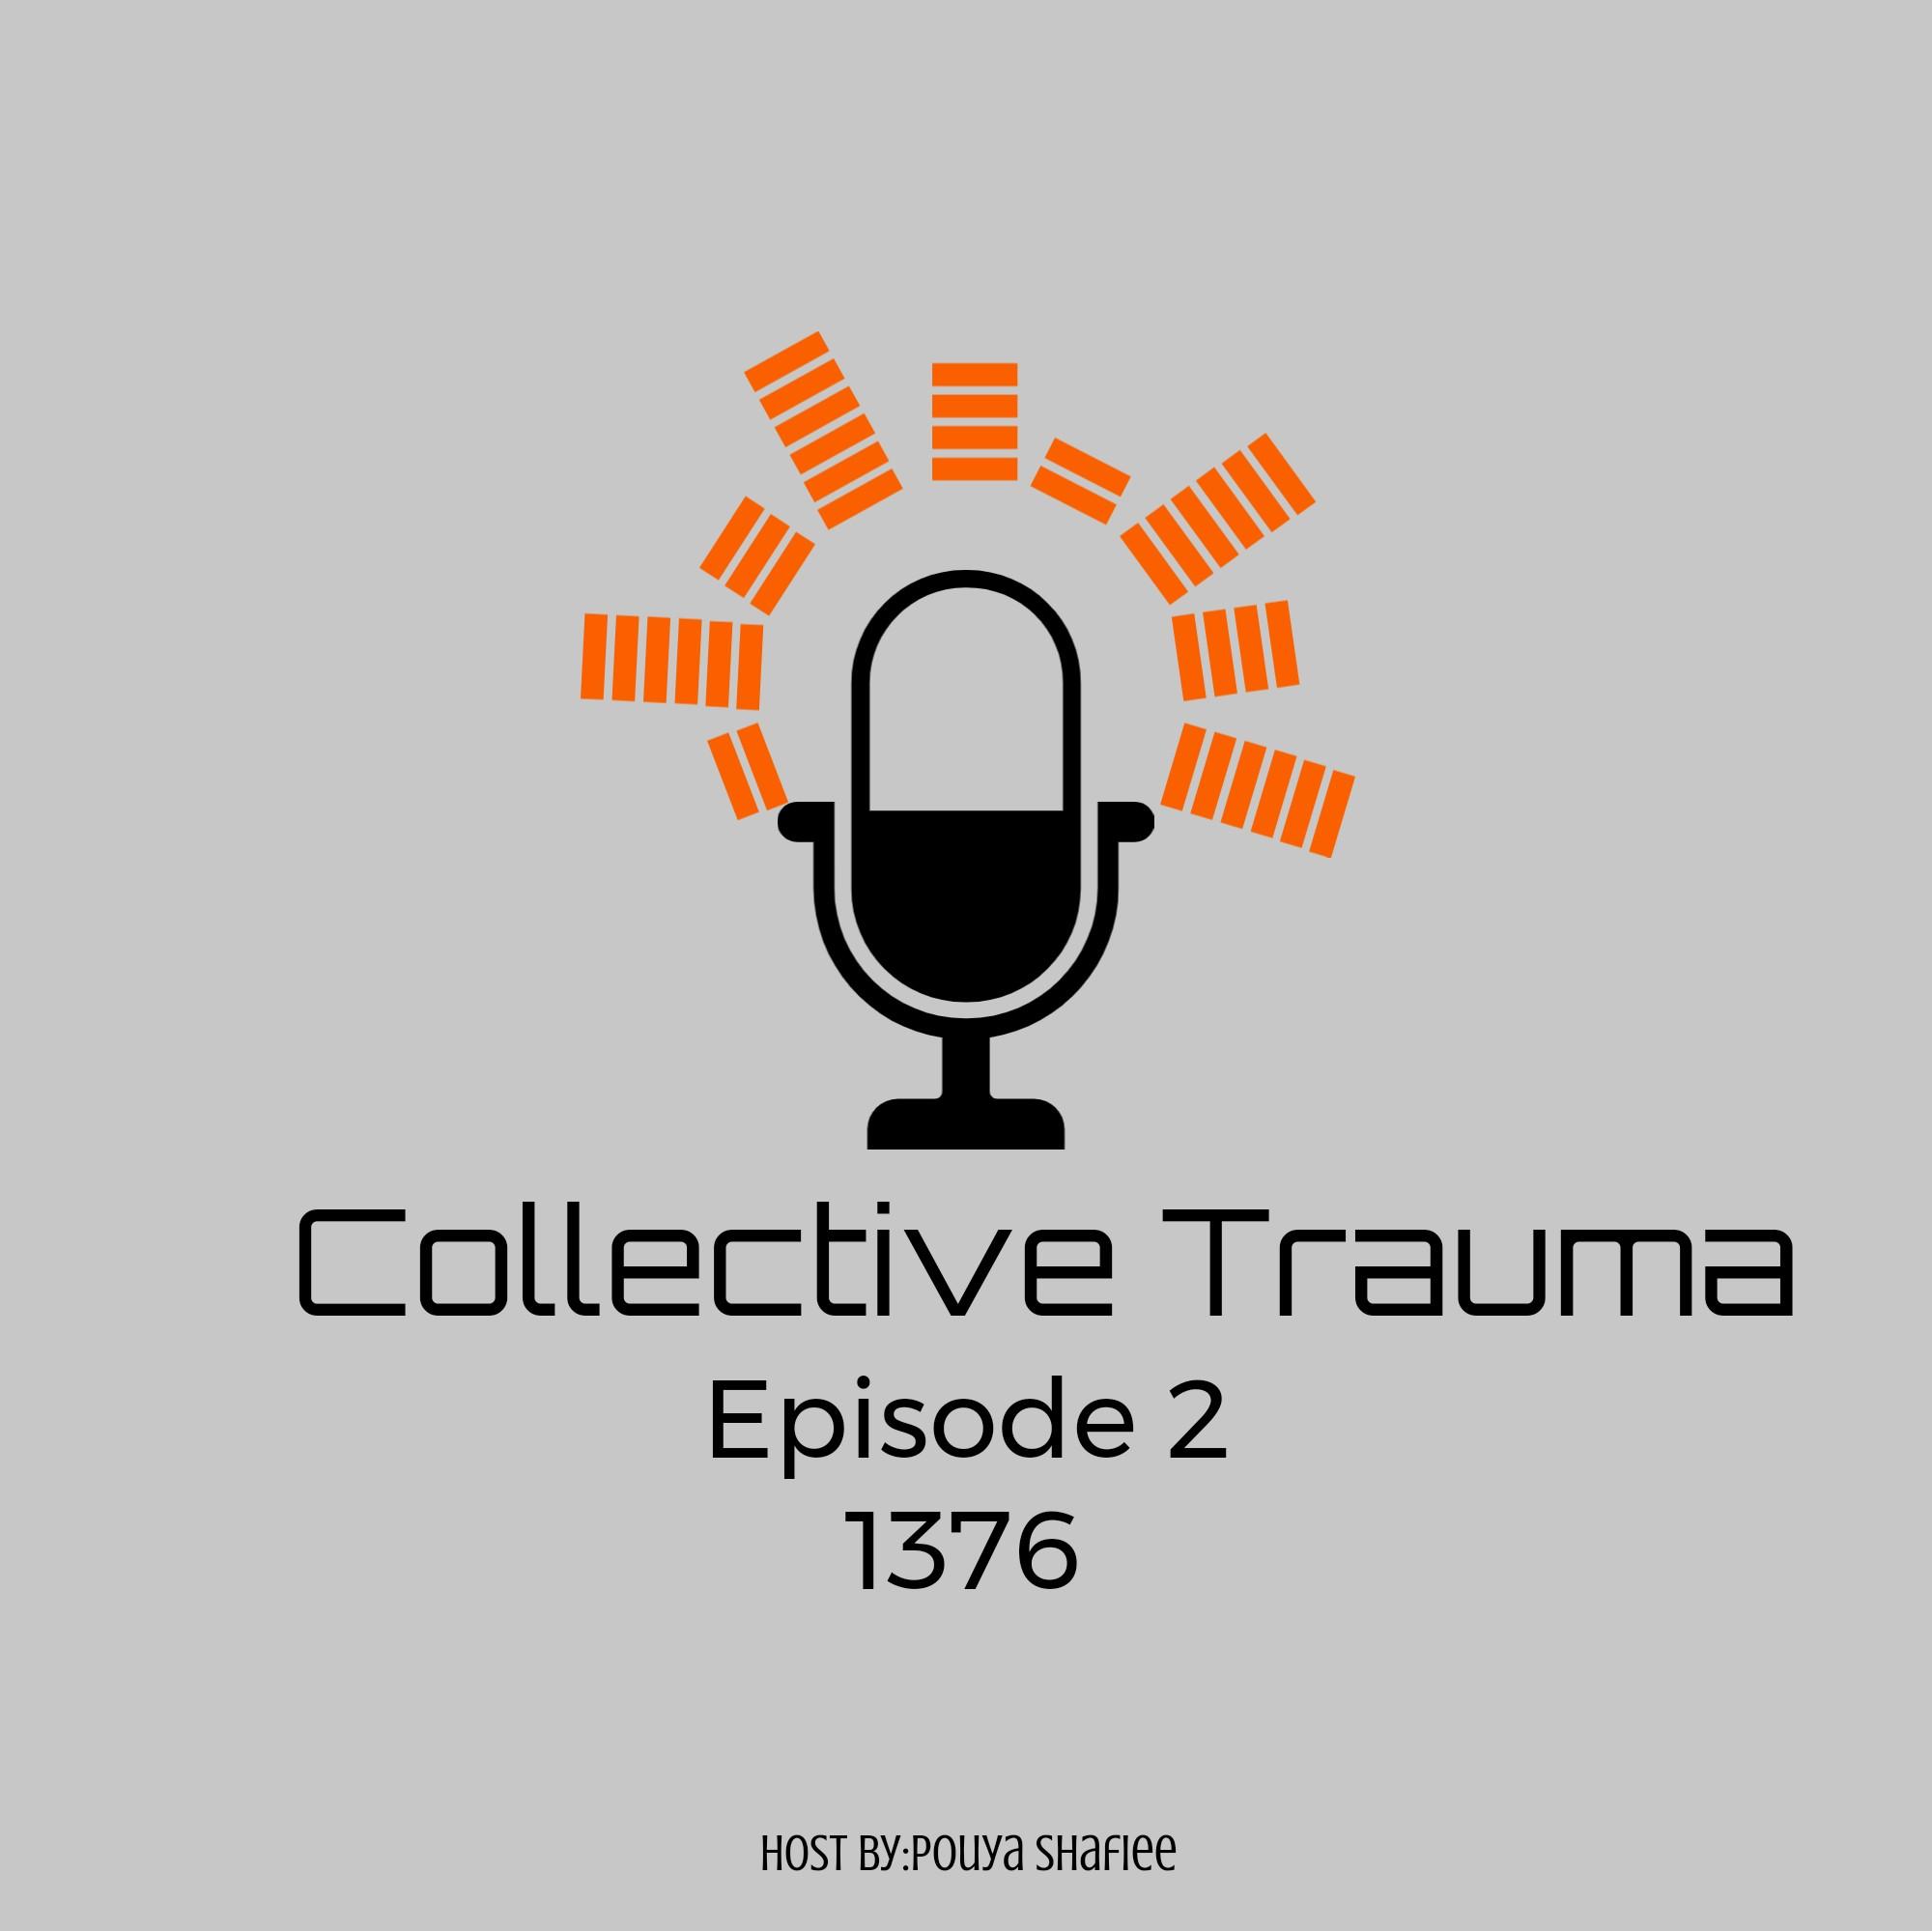 Collective Trauma S1E02 اپیزود دوم فصل اول ترومای جمعی